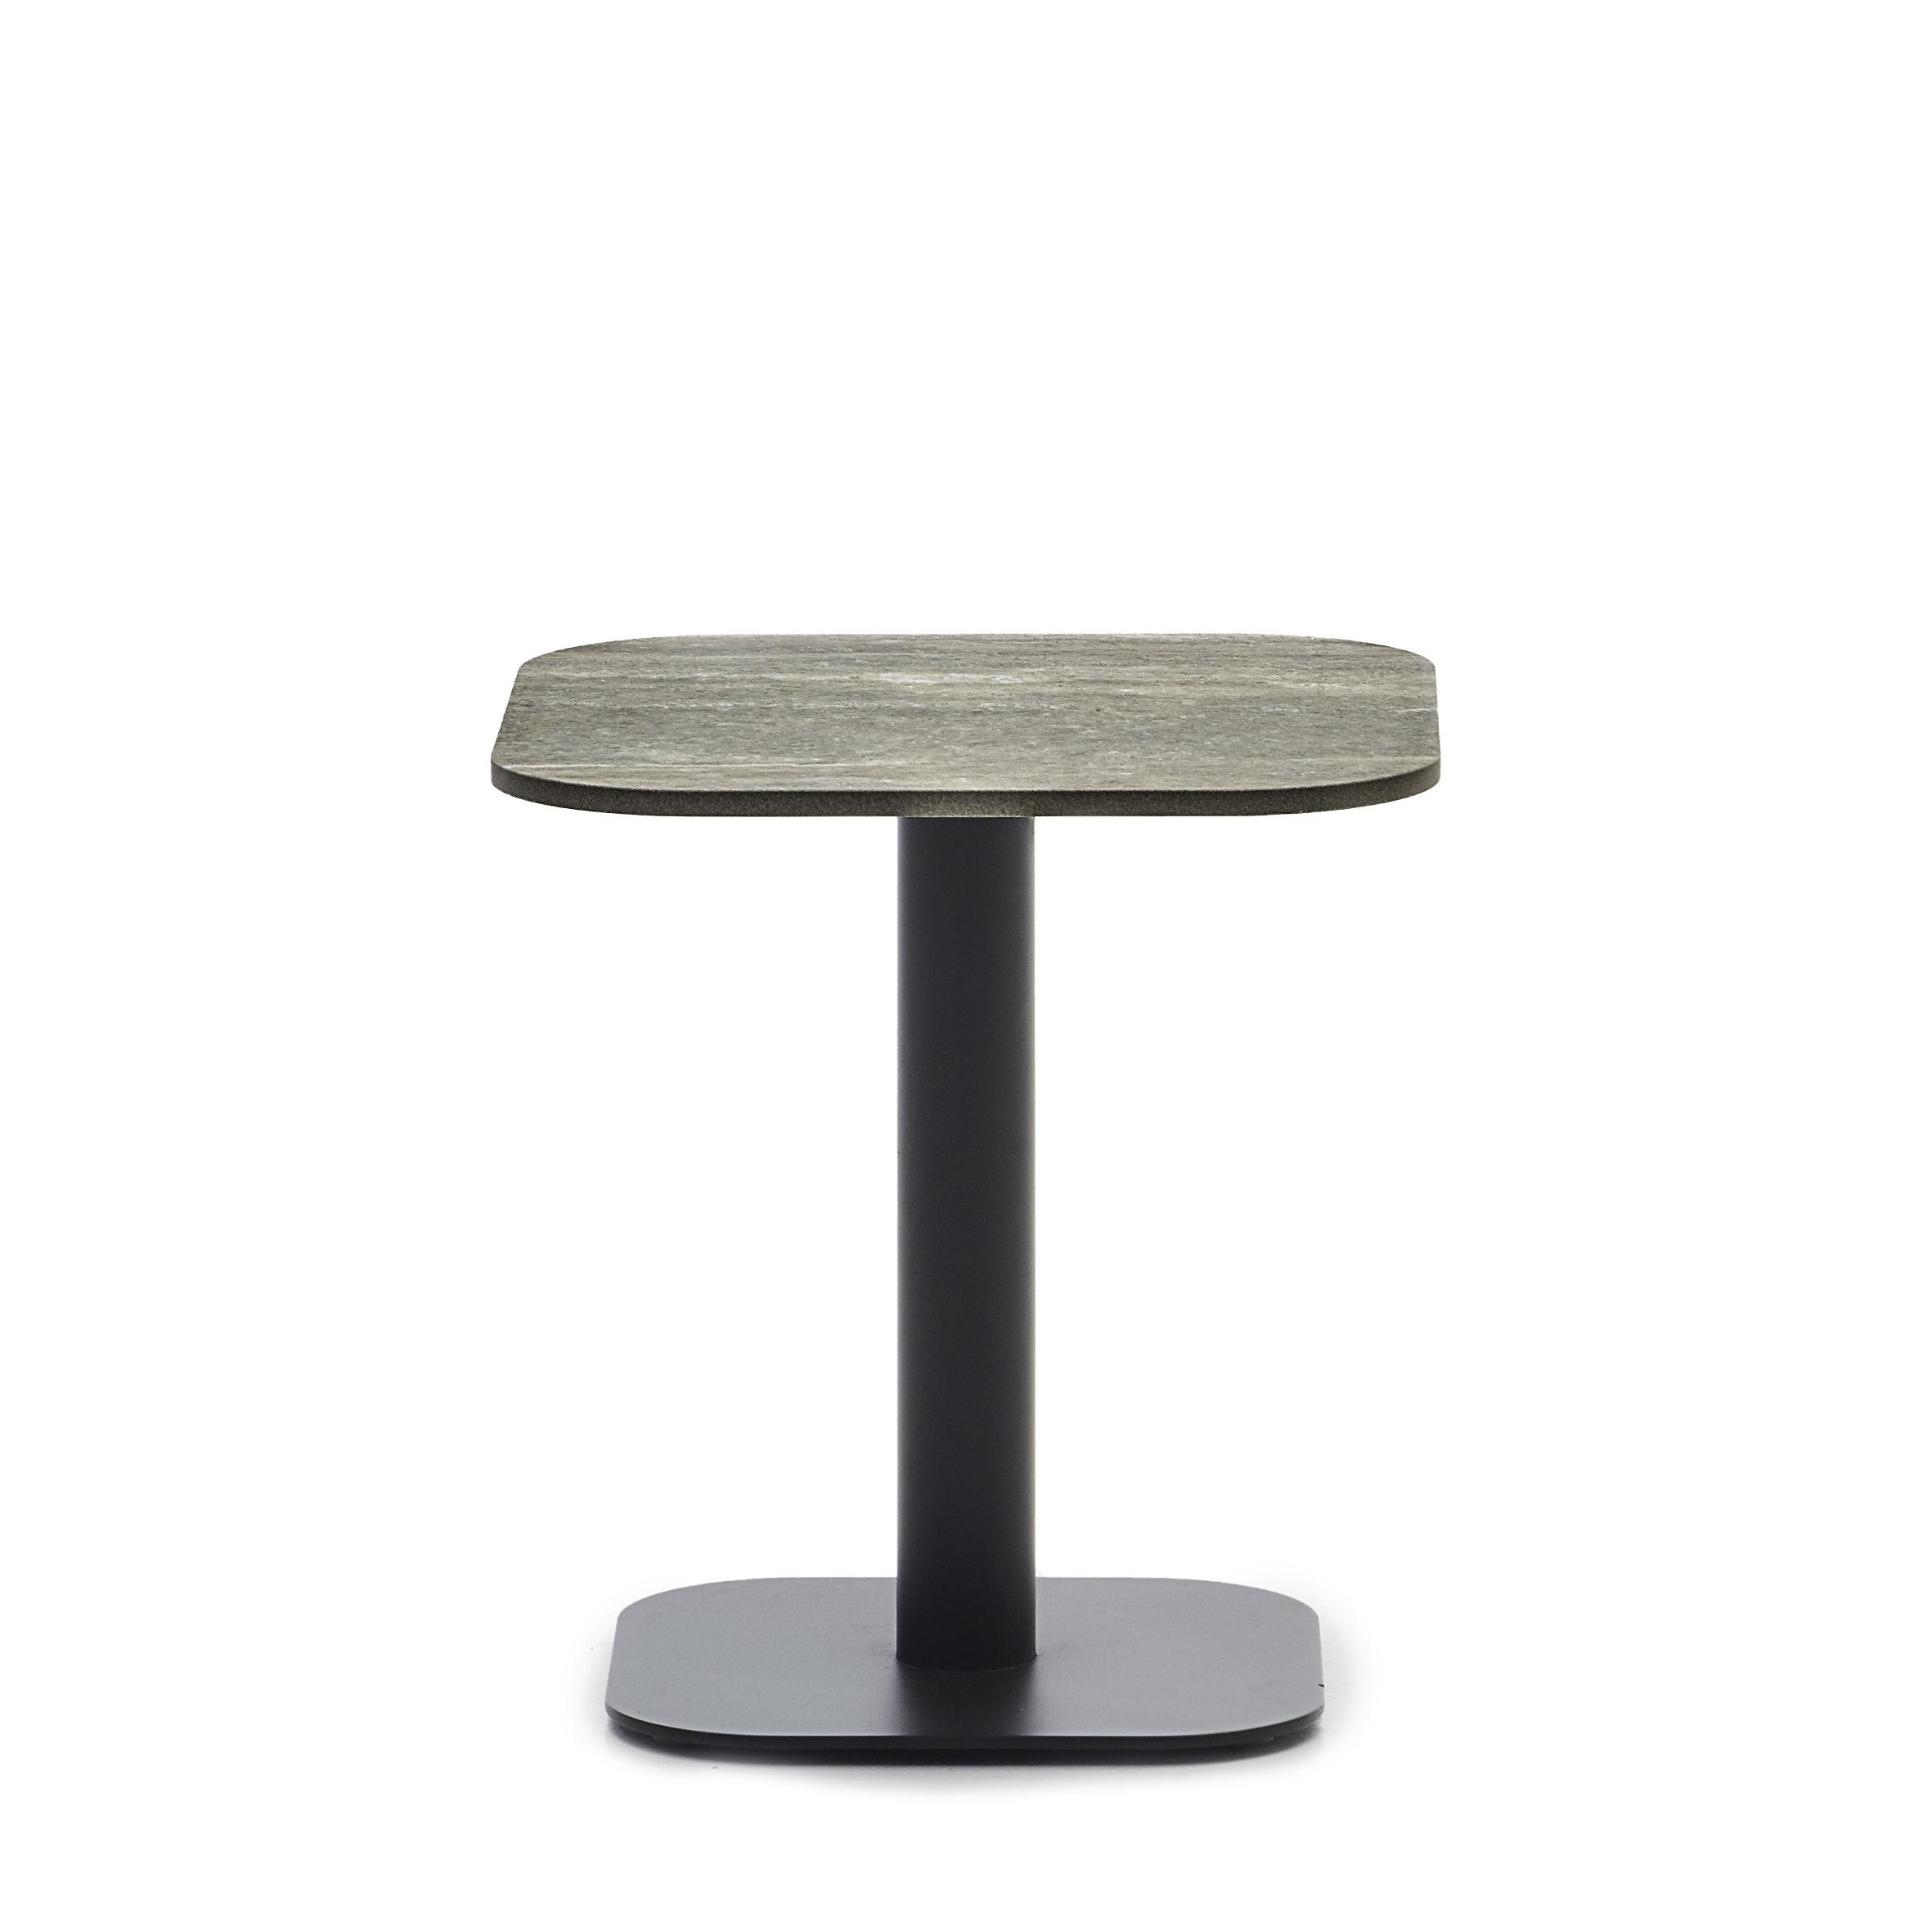 Möbel - Couchtische - Kodo Beistelltisch / 41 x 41 cm - Keramik - Vincent Sheppard - Keramik beige / Fossilgrau - Aluminium thermolaqué, Keramik